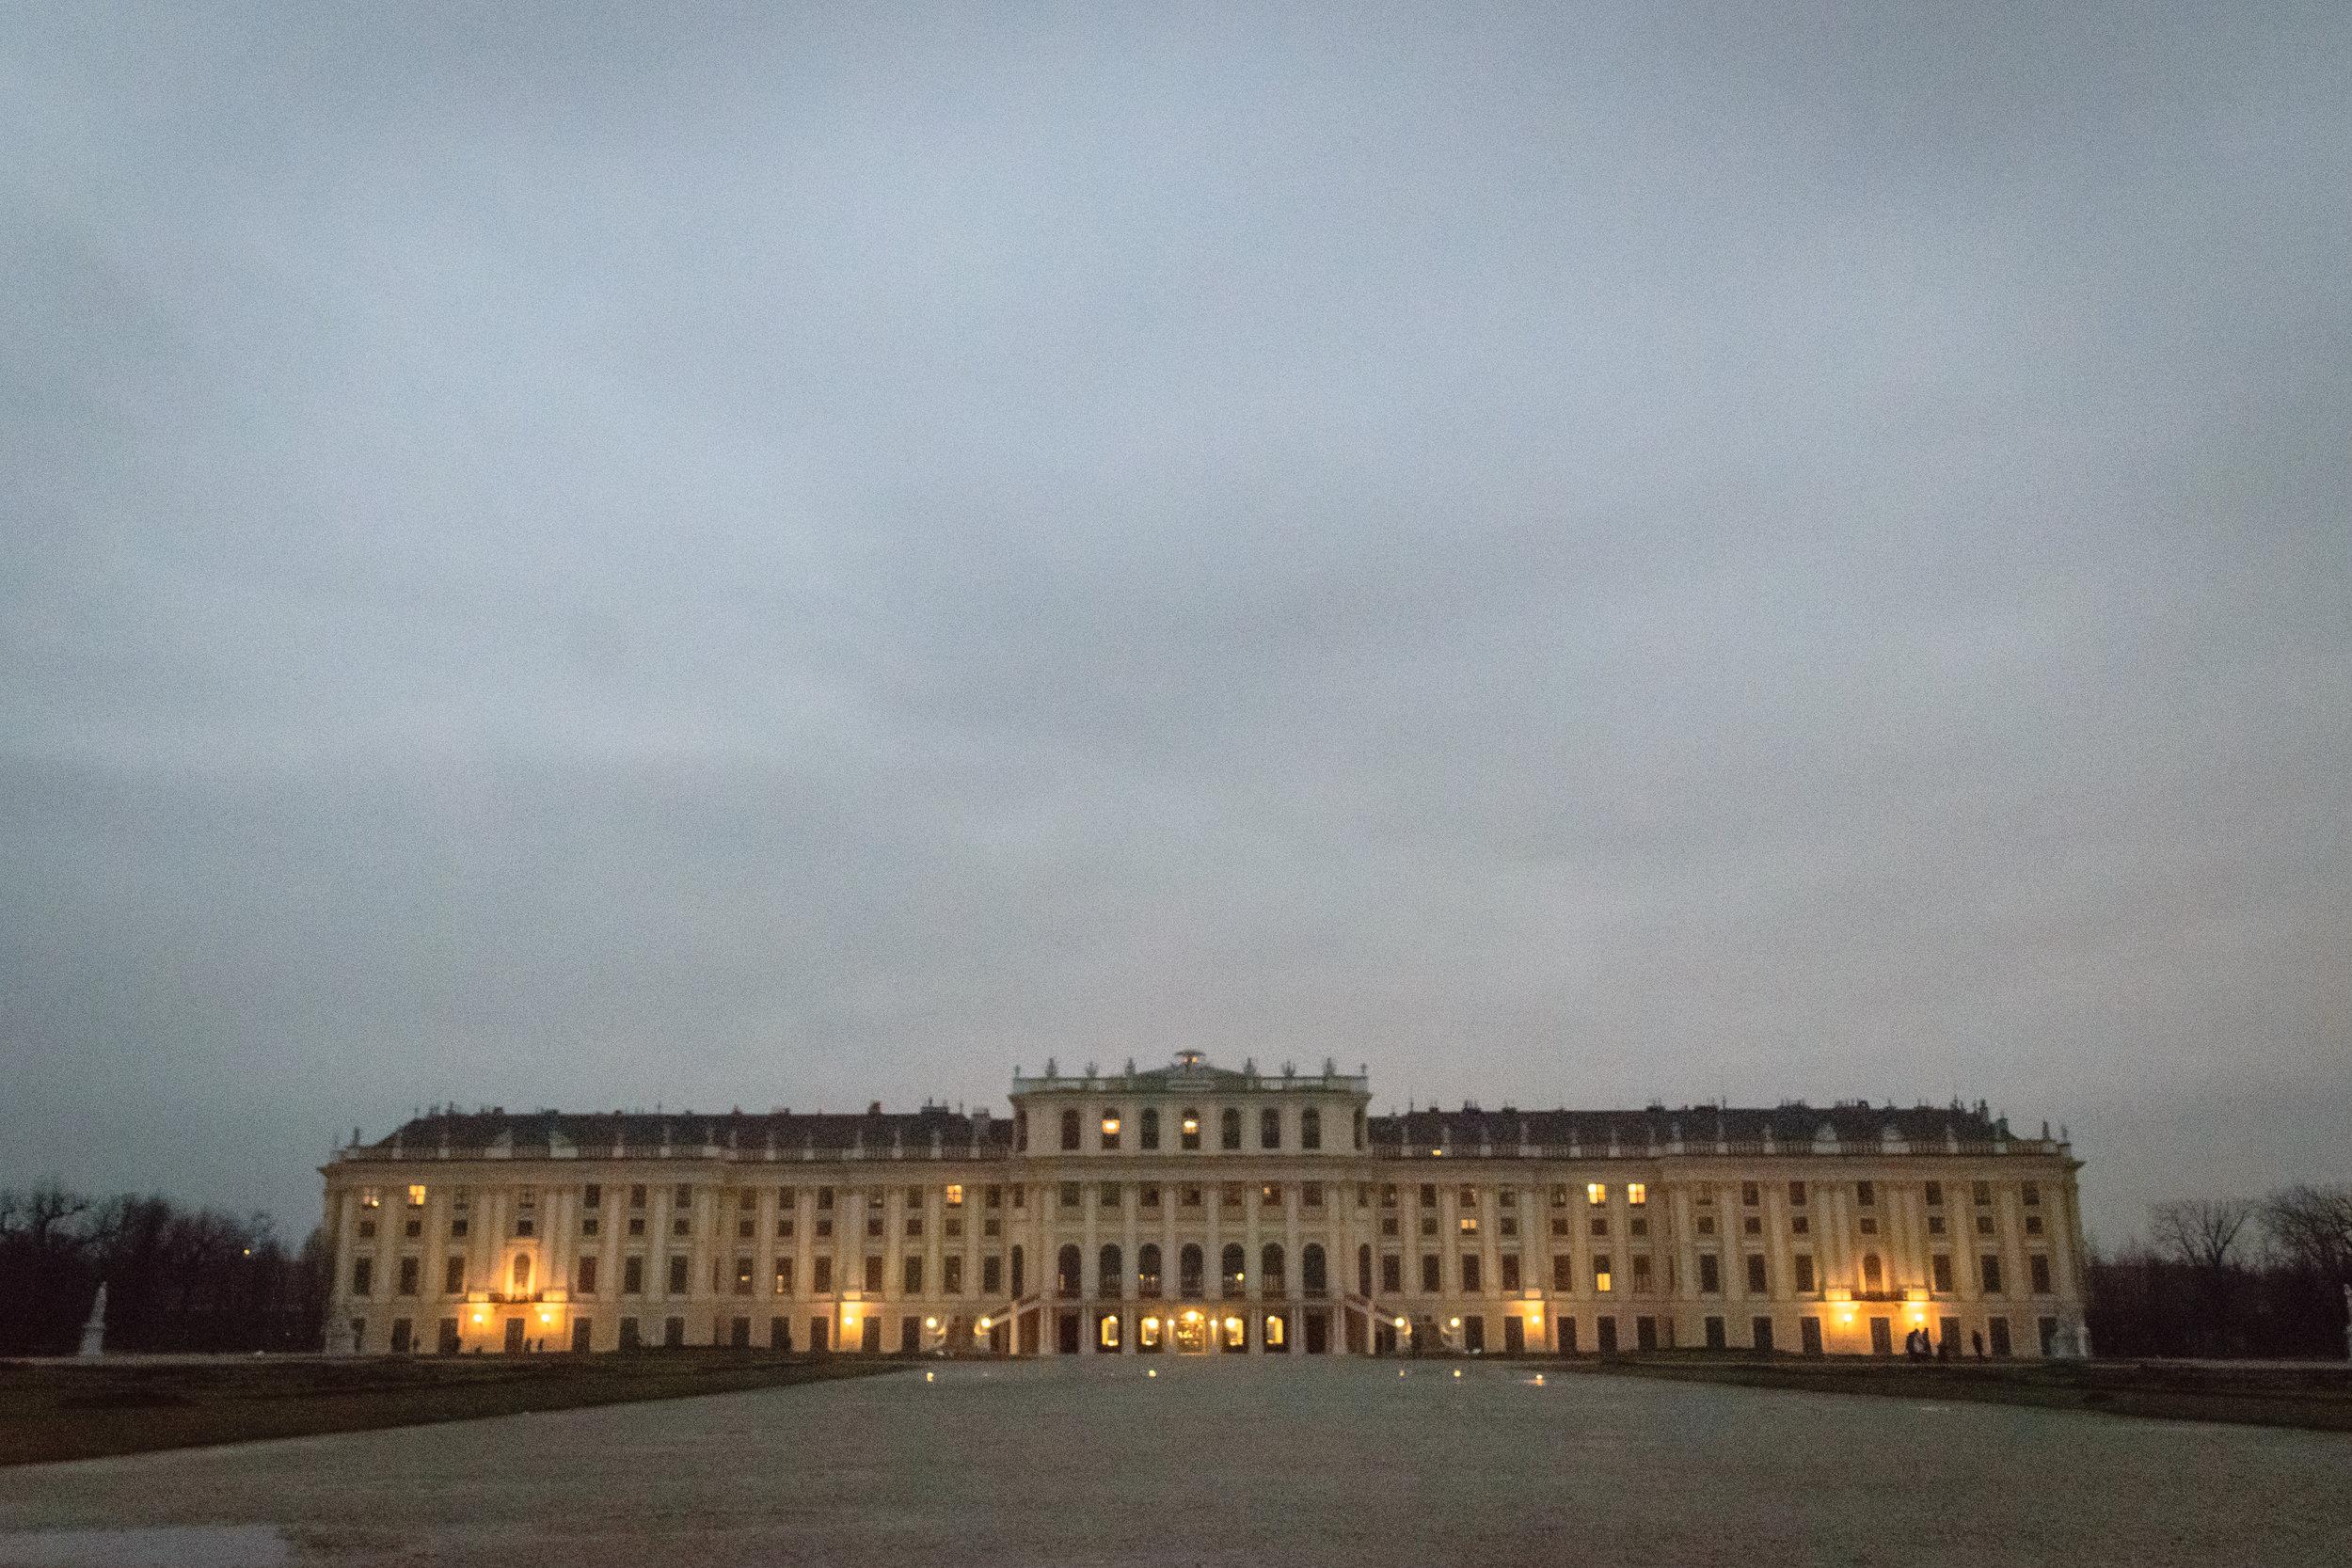 not-so-hot photo of the sprawling Schönbrunner Palace